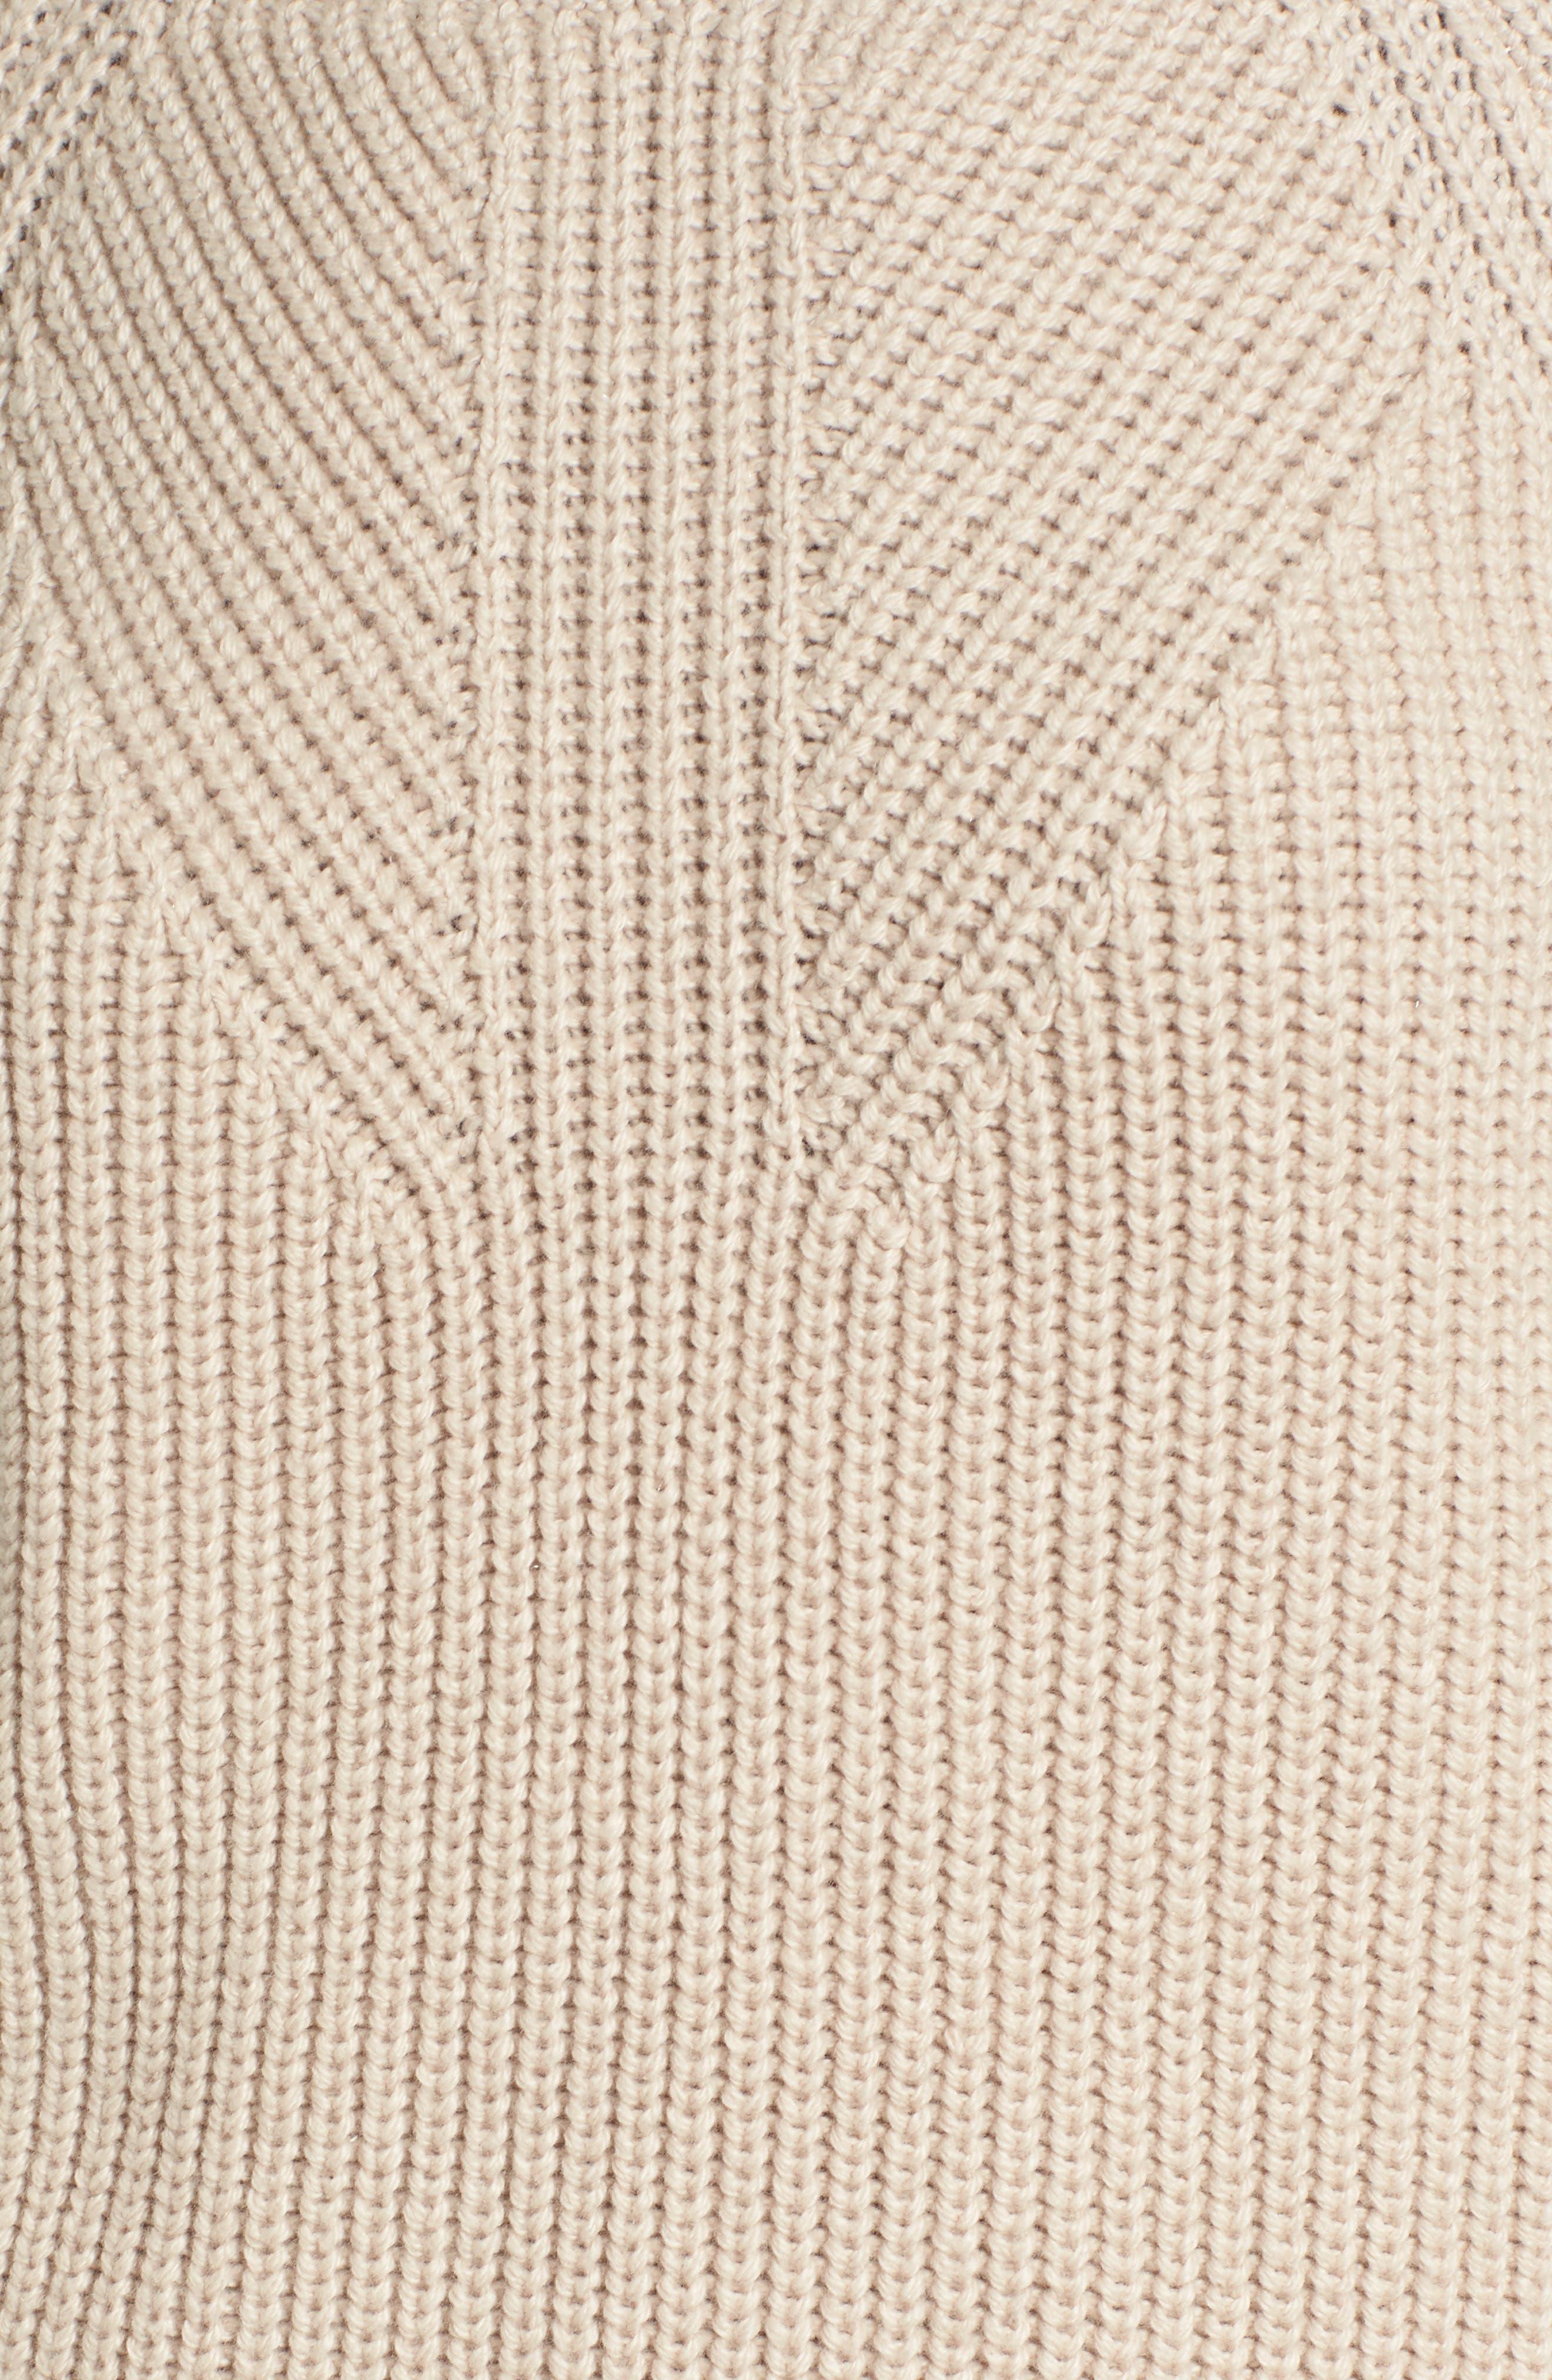 BP.,                             Shaker Stitch Sweater,                             Alternate thumbnail 5, color,                             270